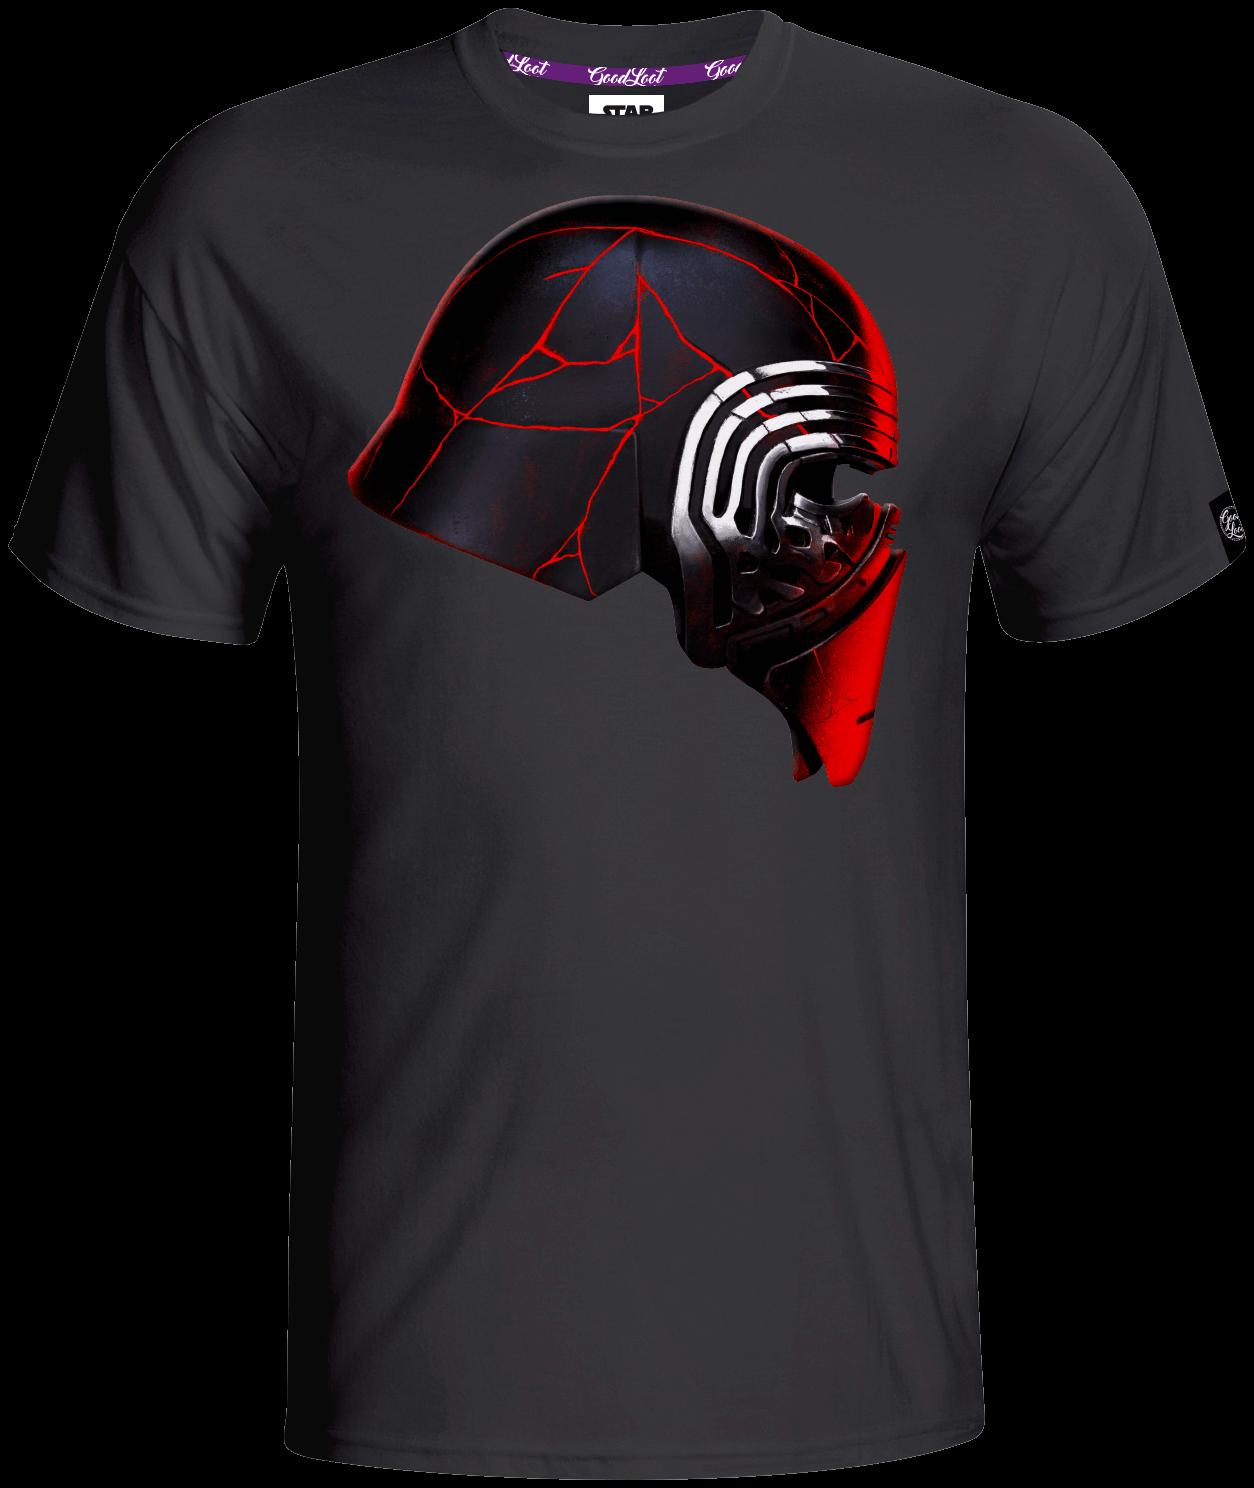 Star Wars Kylo Ren Helmet T-shirt M